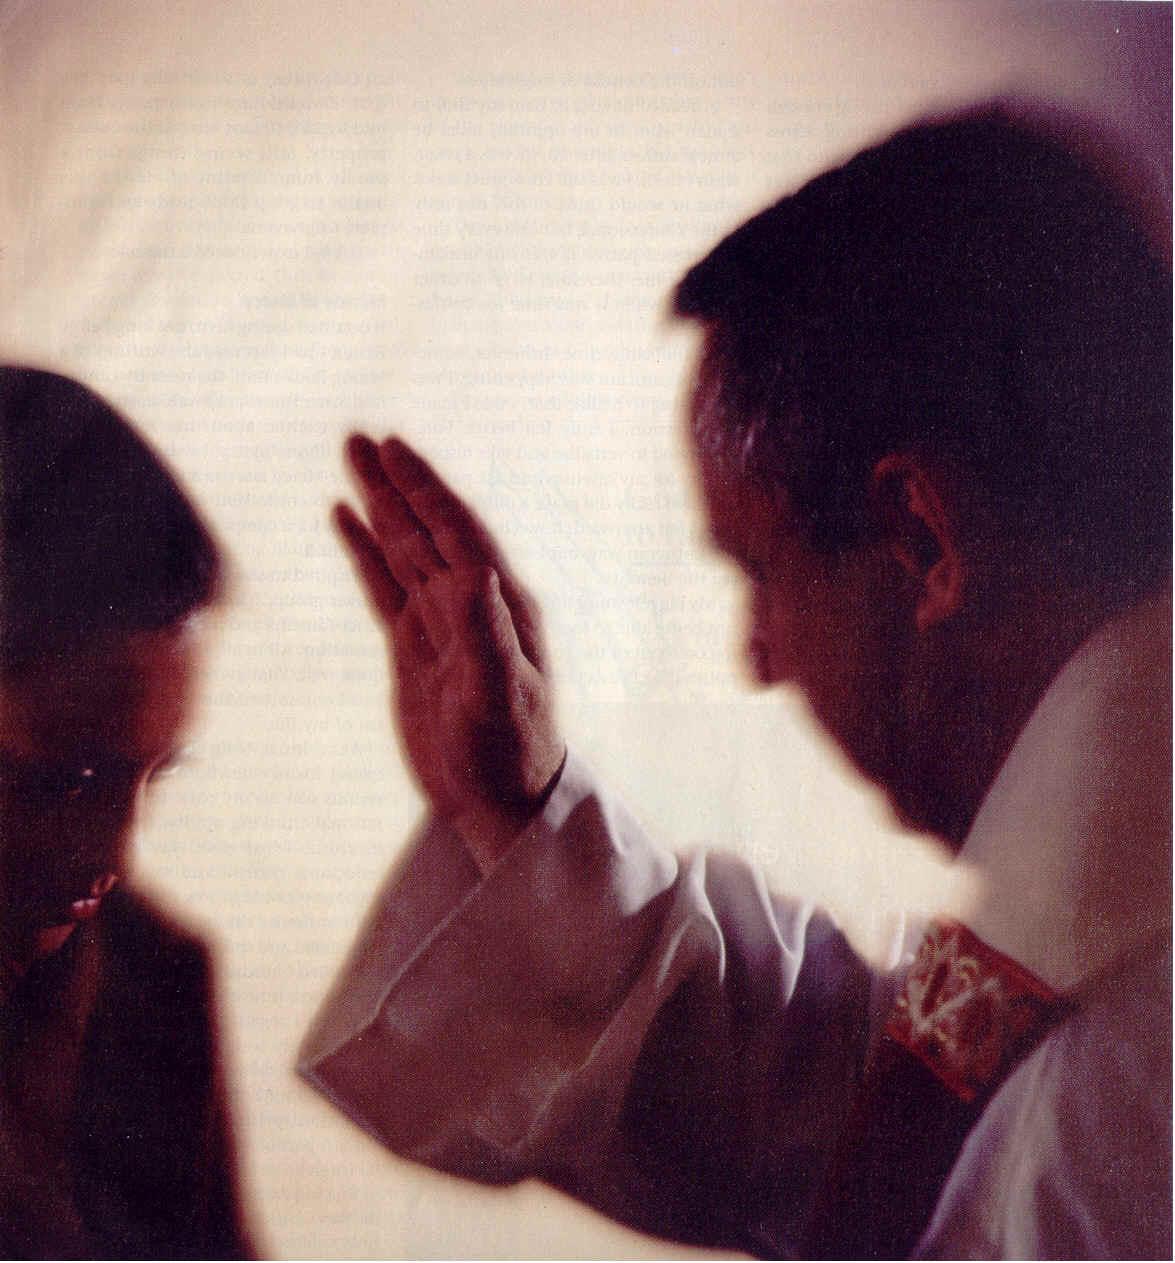 confessionsarticlegraphic2.jpg